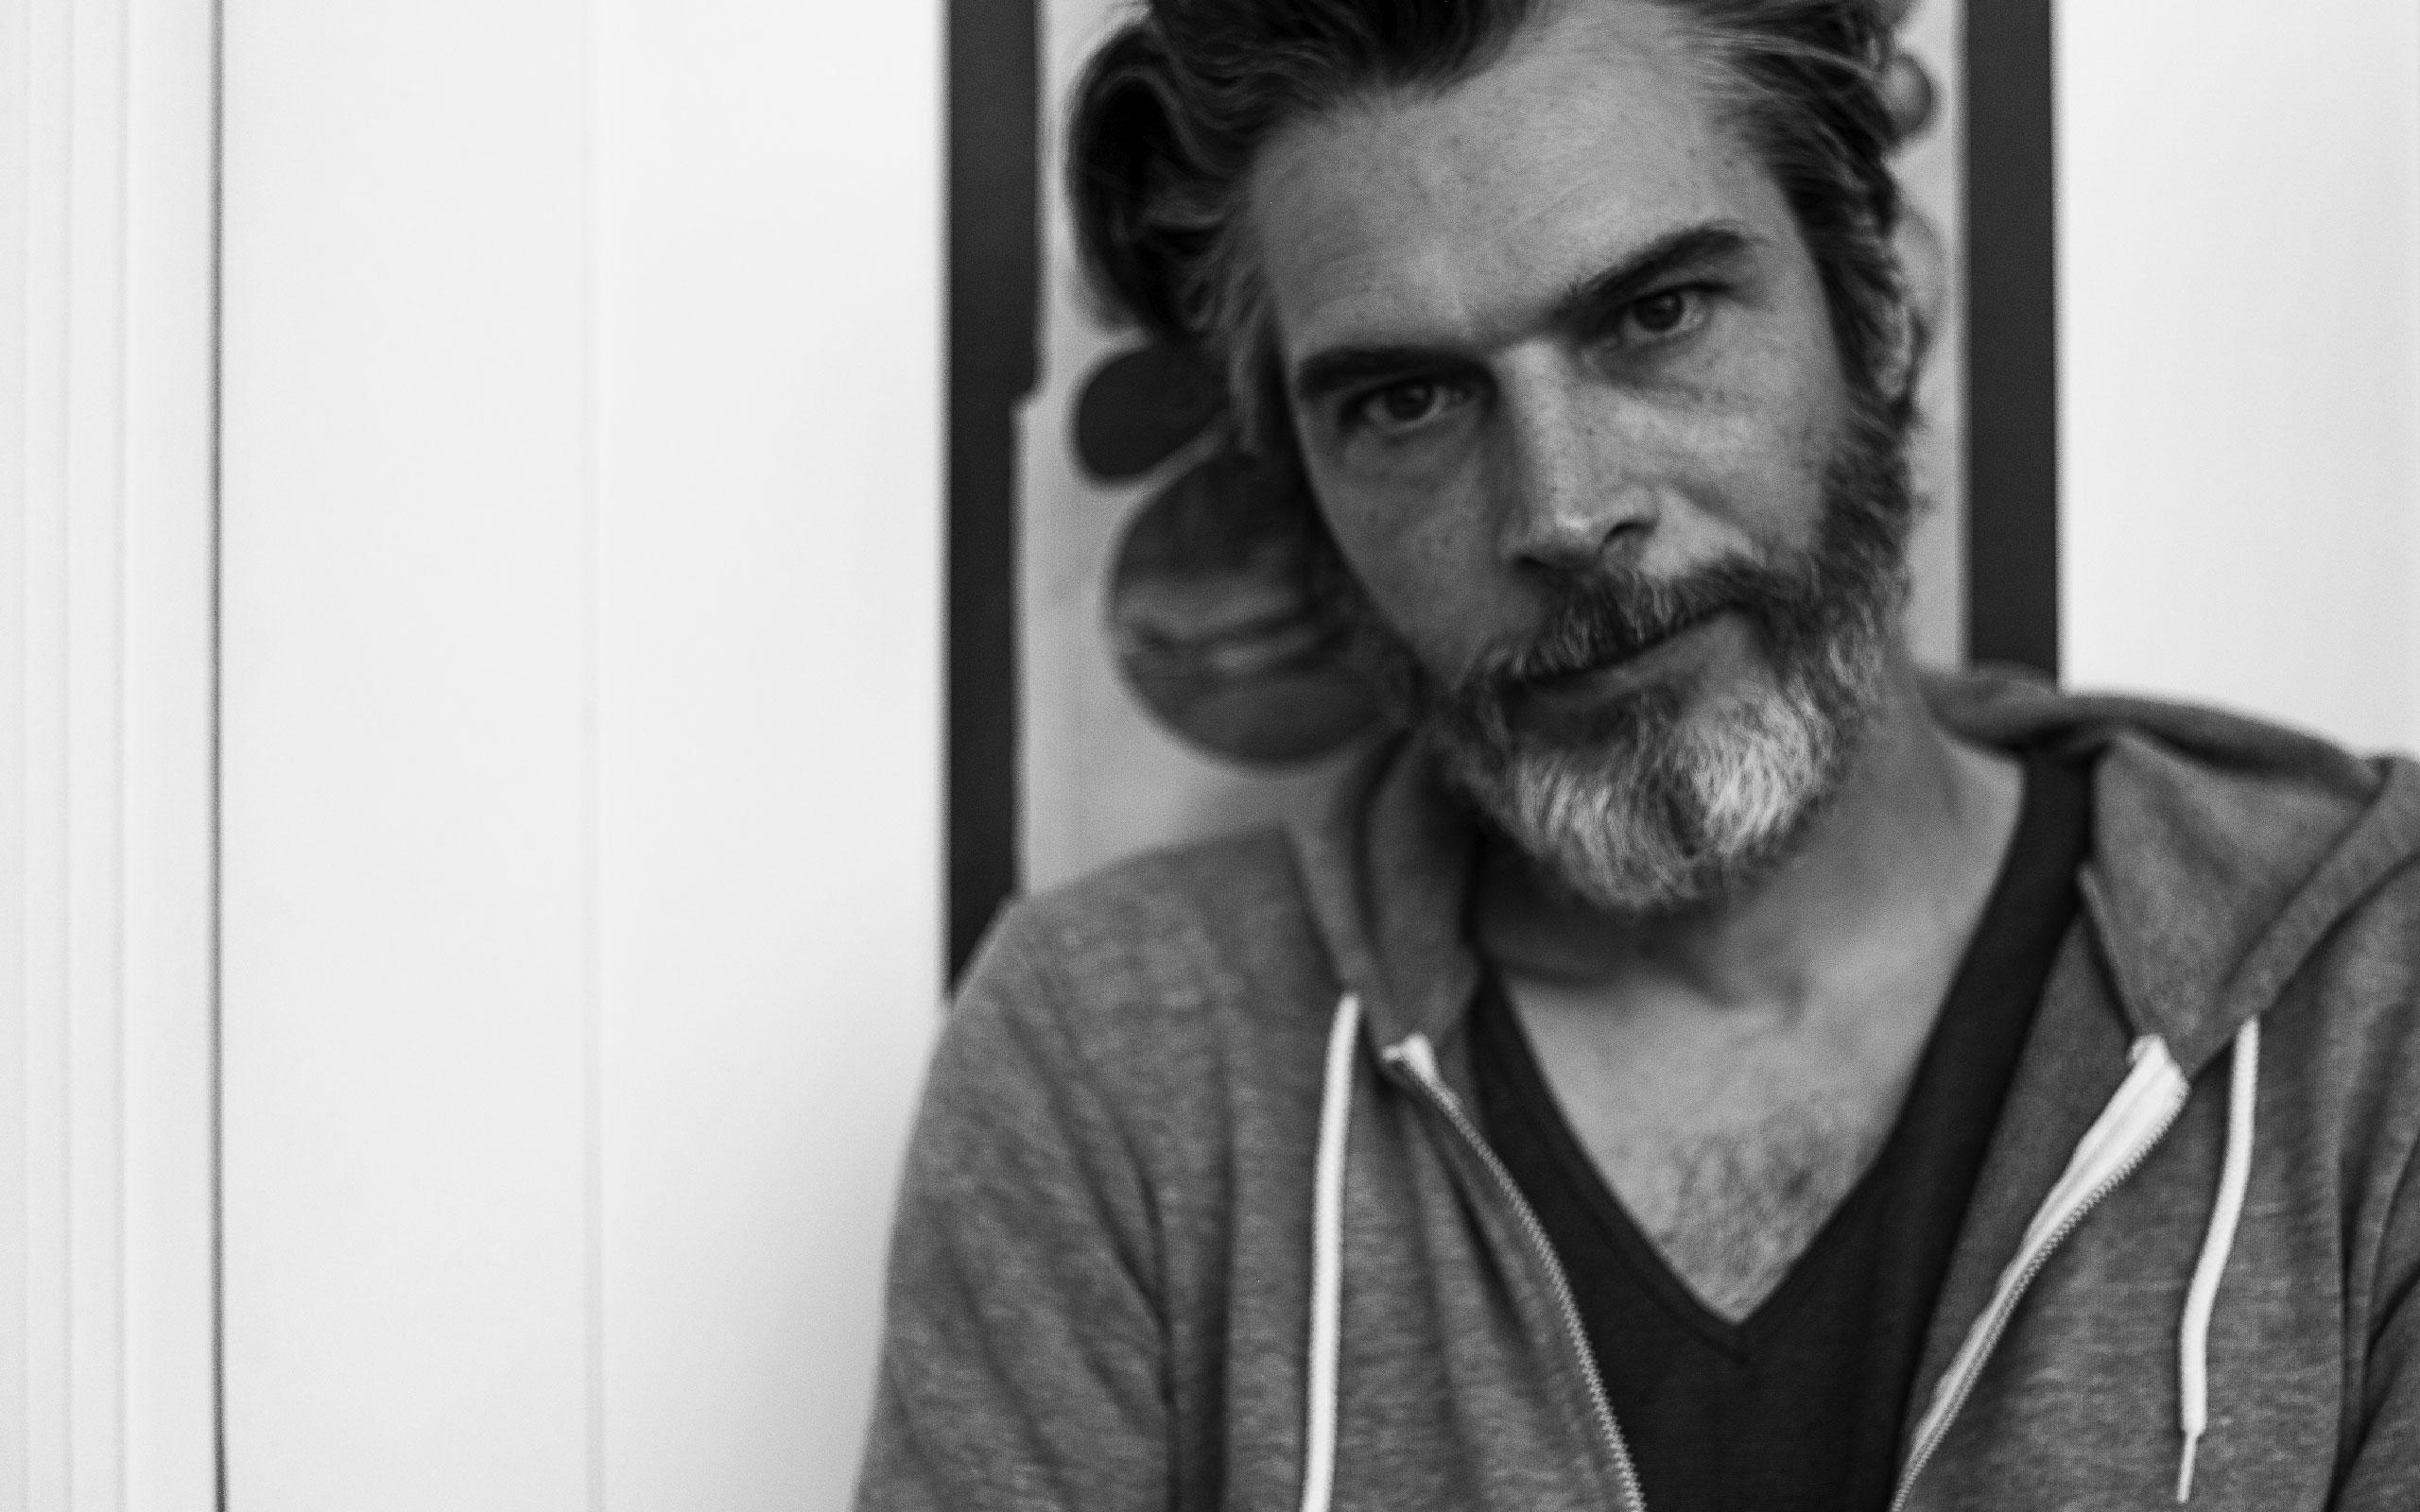 『Purple Fashion Magazine』のアートディレクター、Gianni Oprandi (ジャンニ・オプランディ) インタビュー